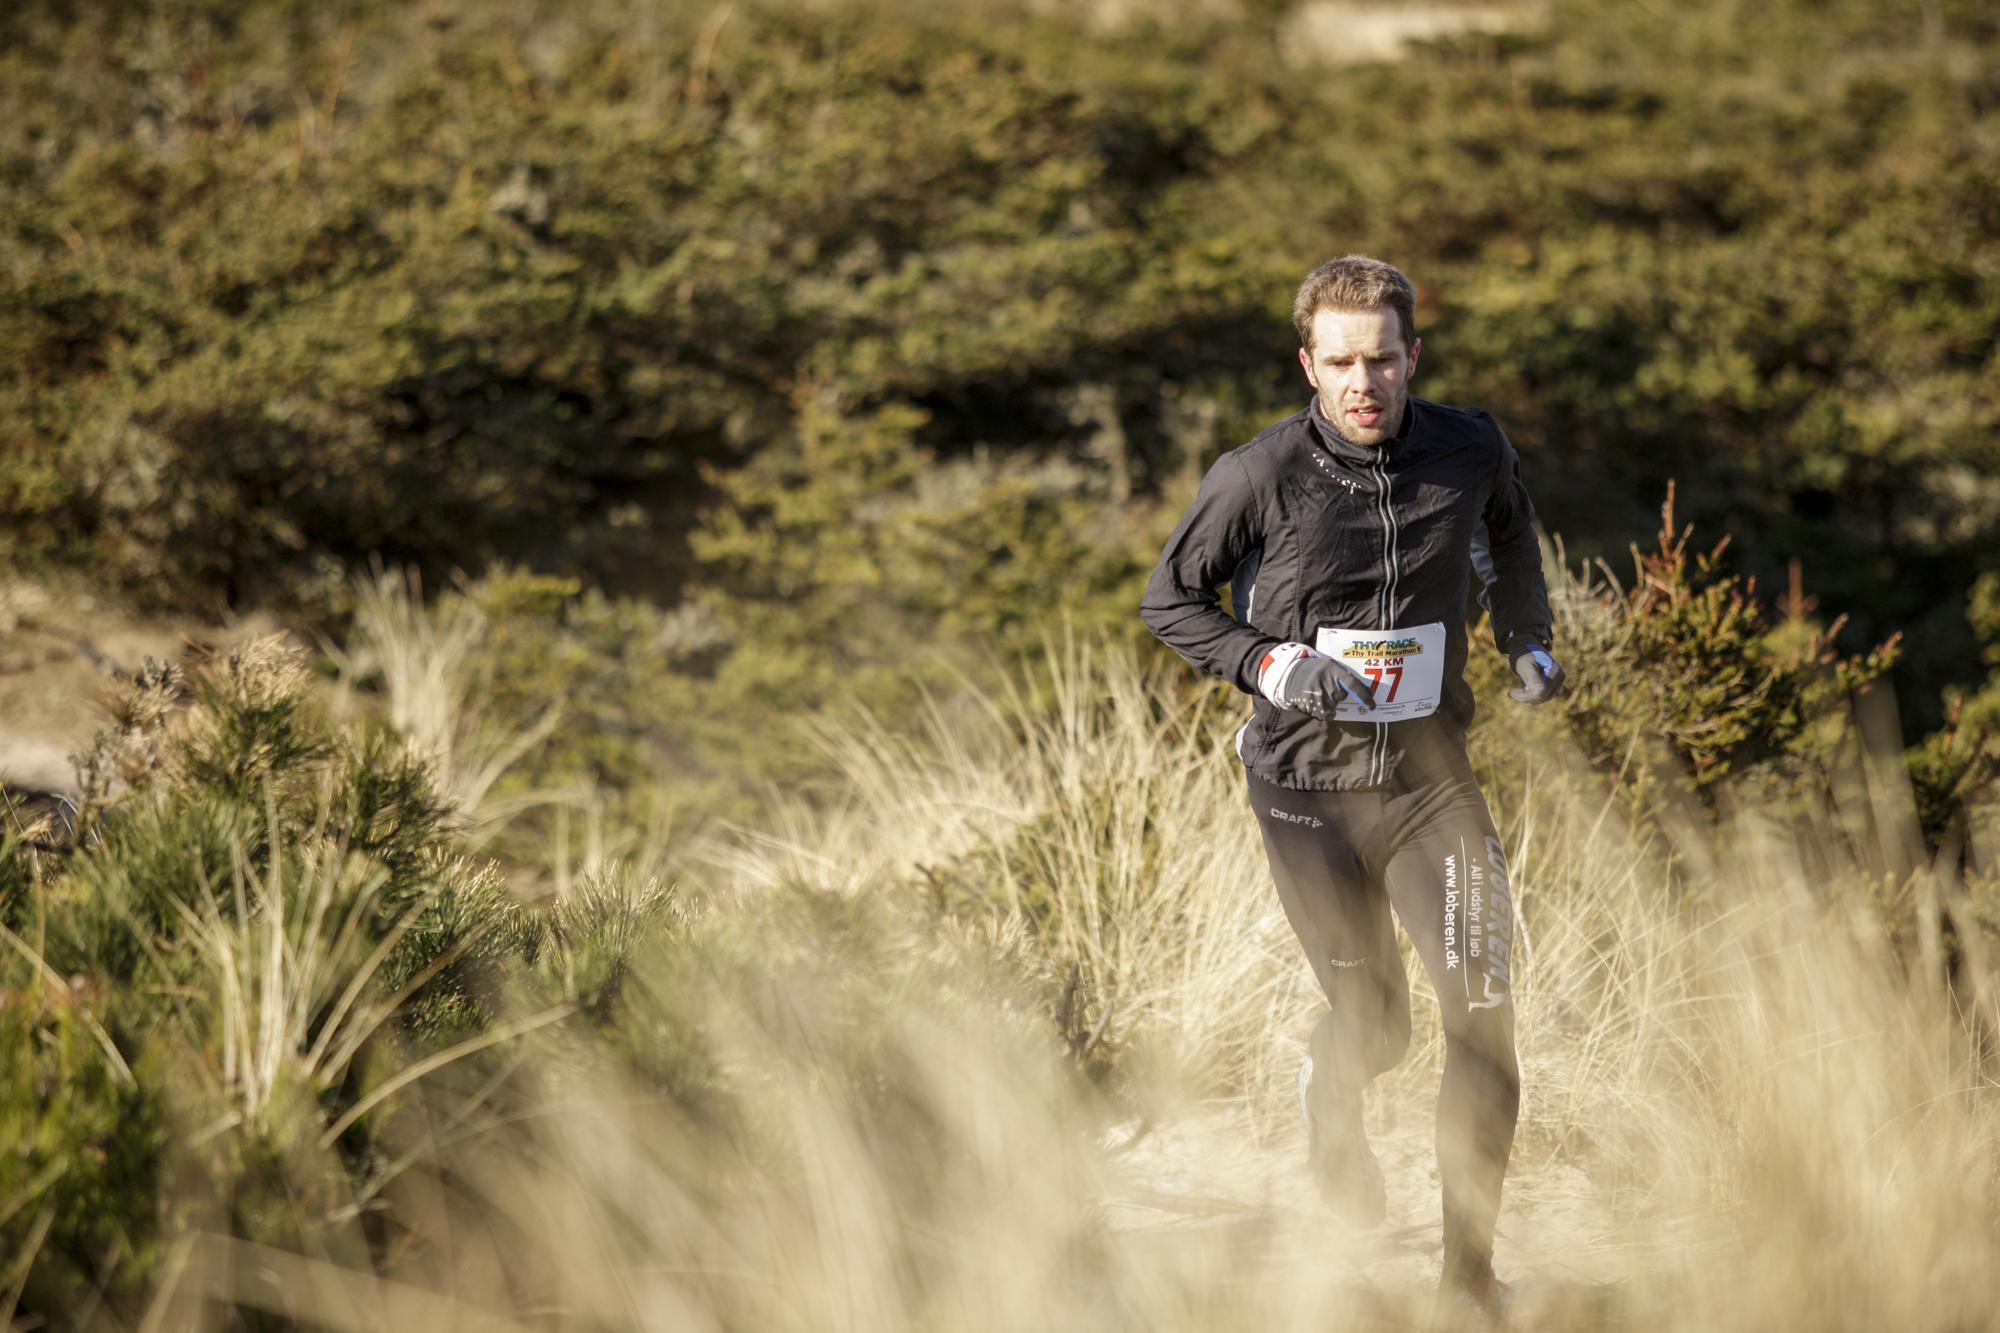 10 km til mål på Thy Trail Marathon 2013.  Foto: Martin Paldan